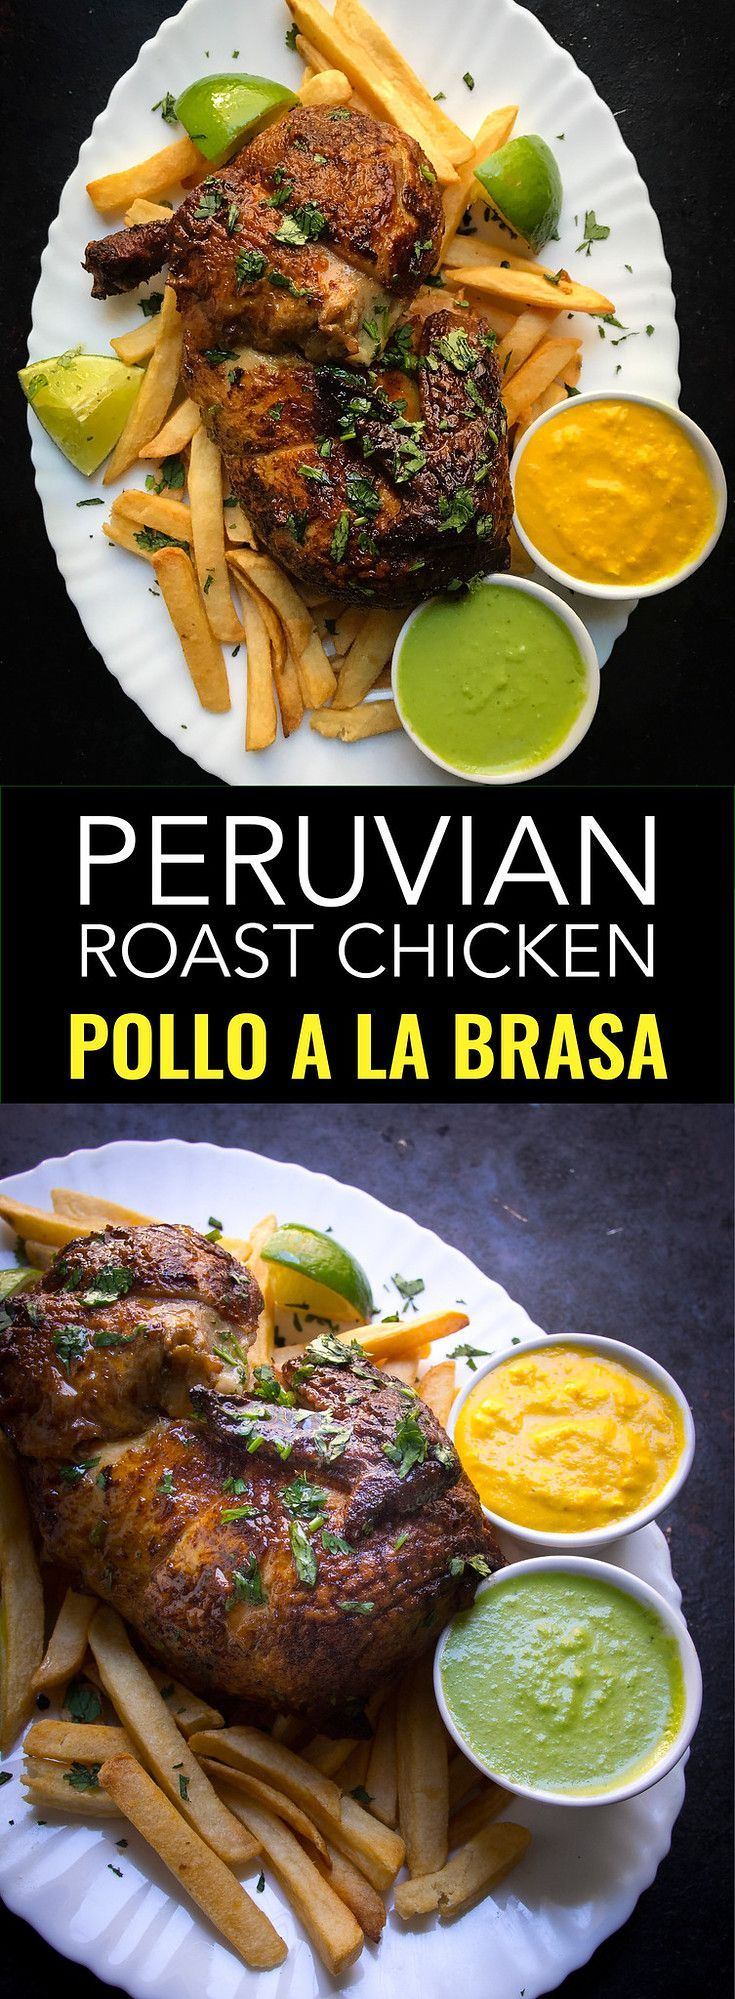 Pollo a la brasa is an easy Peruvian chicken recipe with incredible sauces aji verde and aji amarillo.